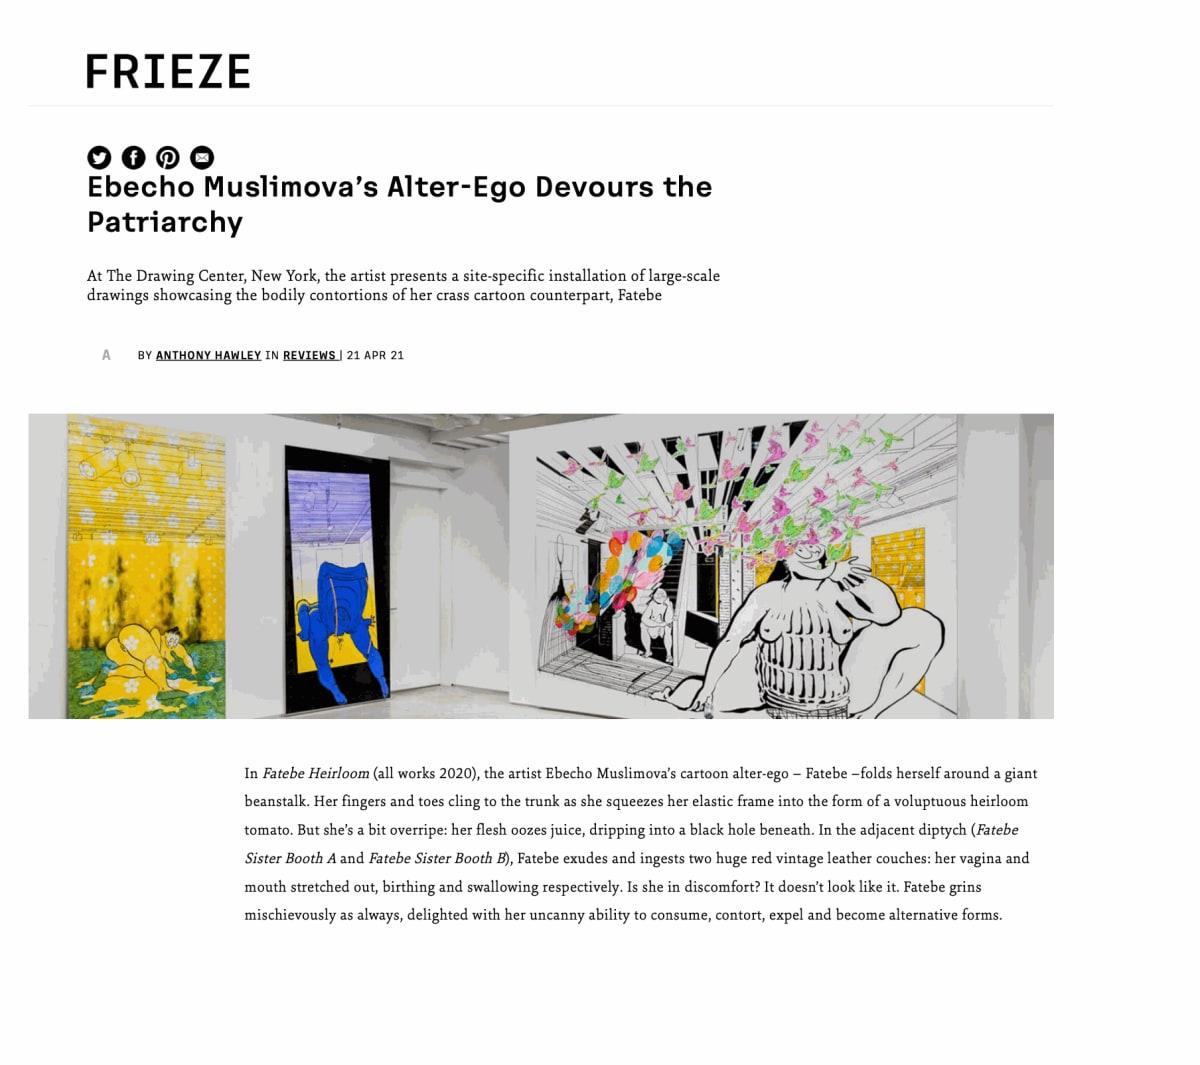 Ebecho Muslimova's Alter-Ego Devours the Patriarchy | Frieze | by Anthony Hawley